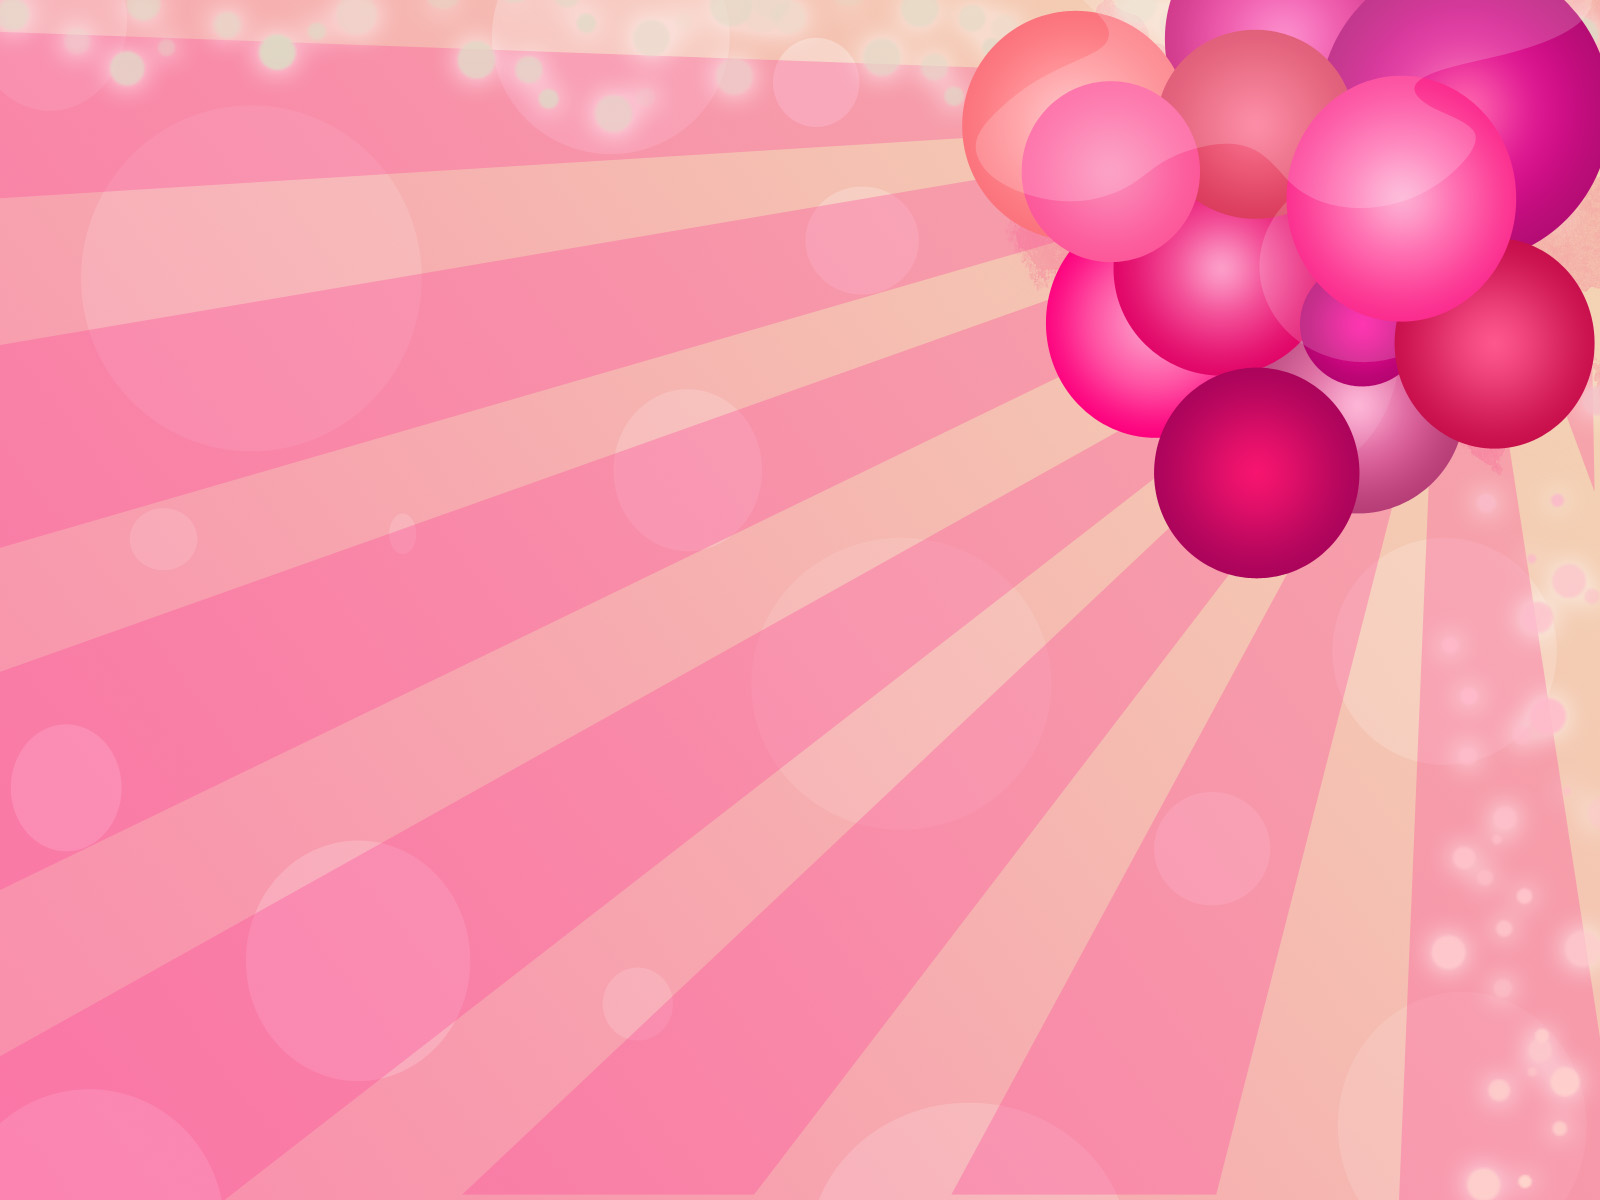 love pink wallpapers cute pink wallpapers pink wallpapers for desktop 1600x1200